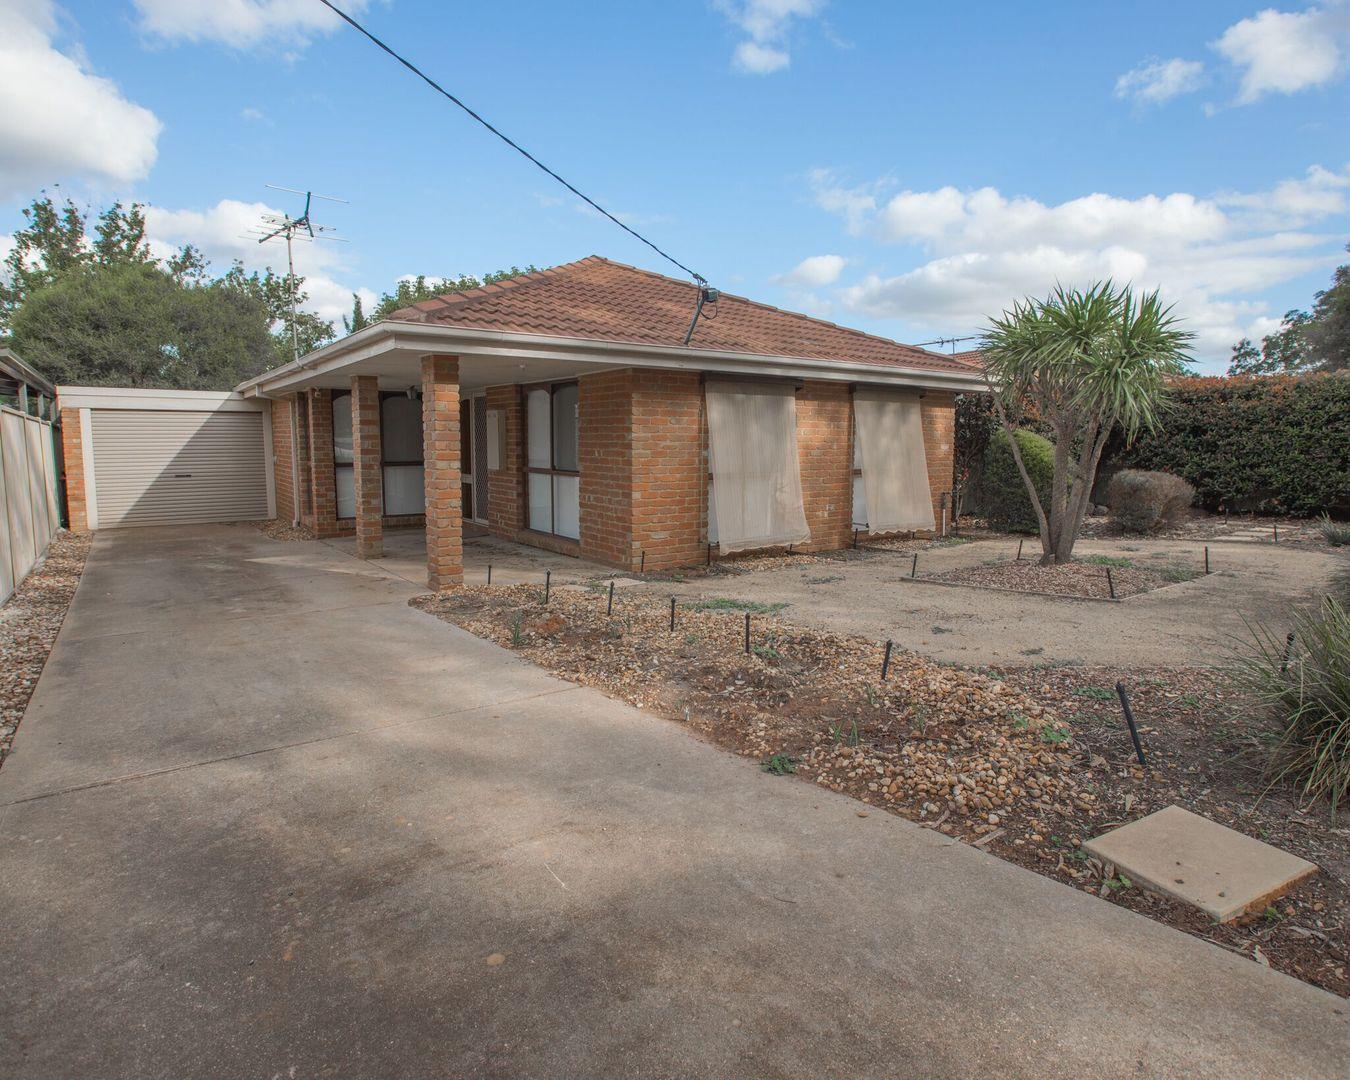 128 Gisborne Road, Bacchus Marsh VIC 3340, Image 0